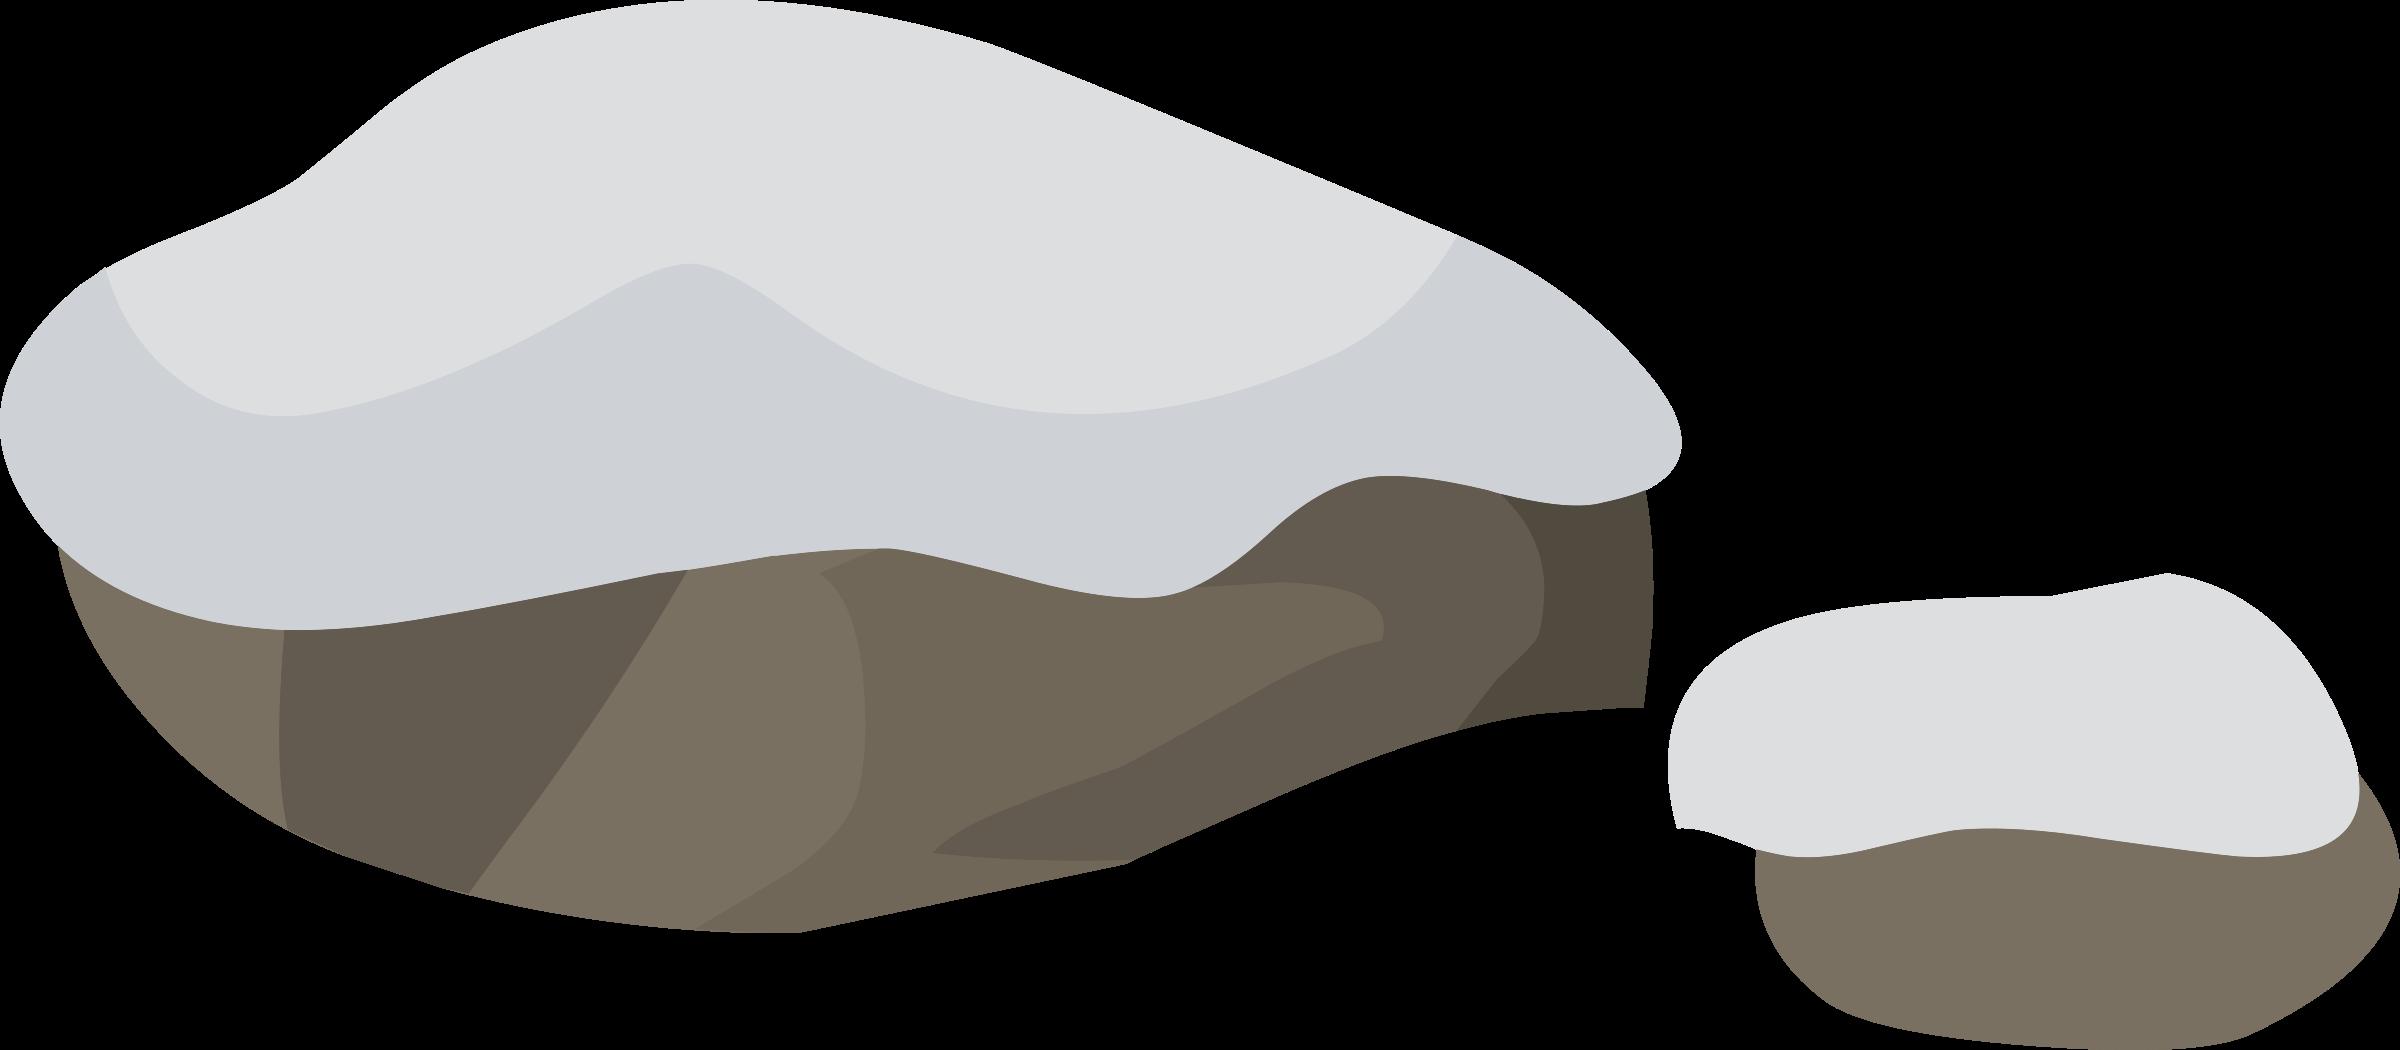 Rock Clipart